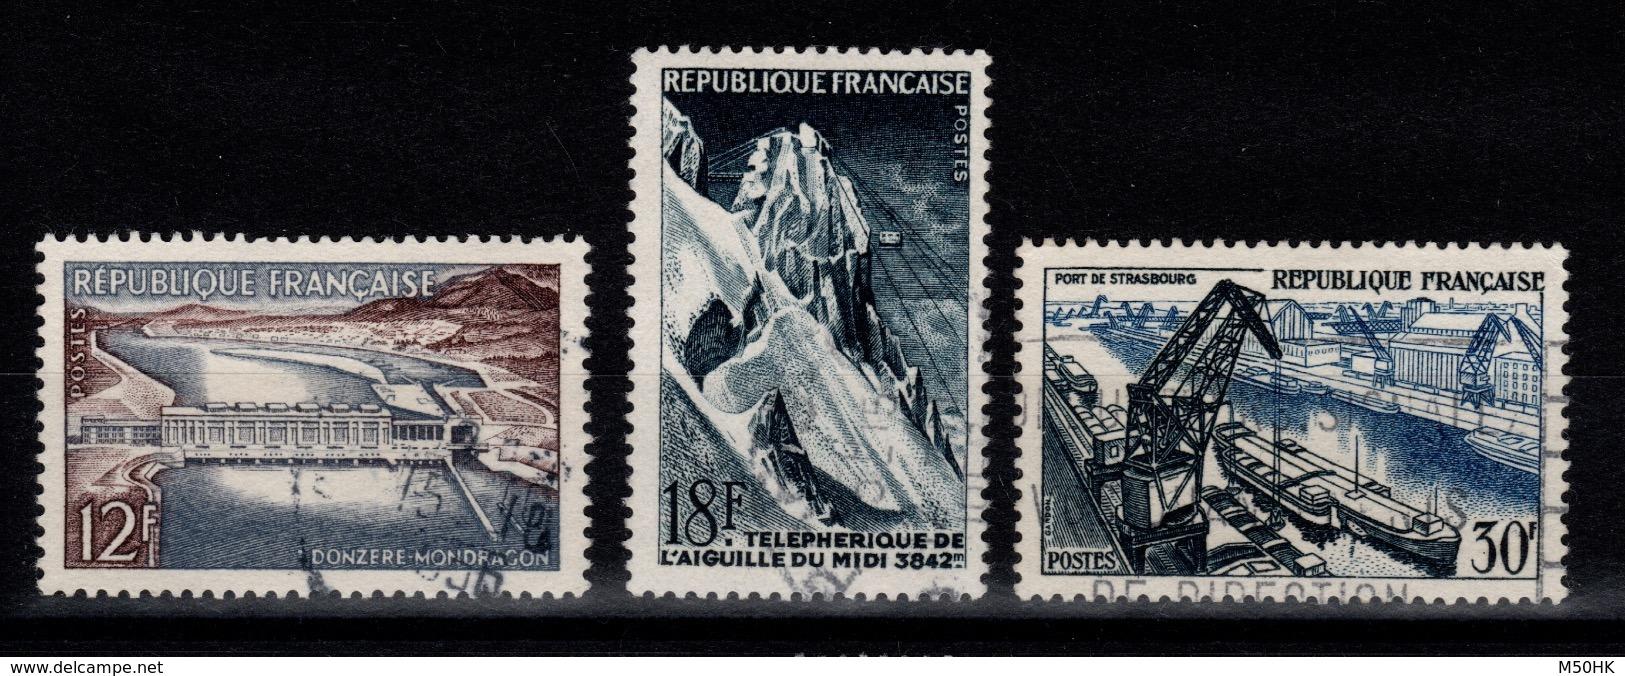 YV 1078 à 1080 Obliteres Cote 11,50 Euros - France